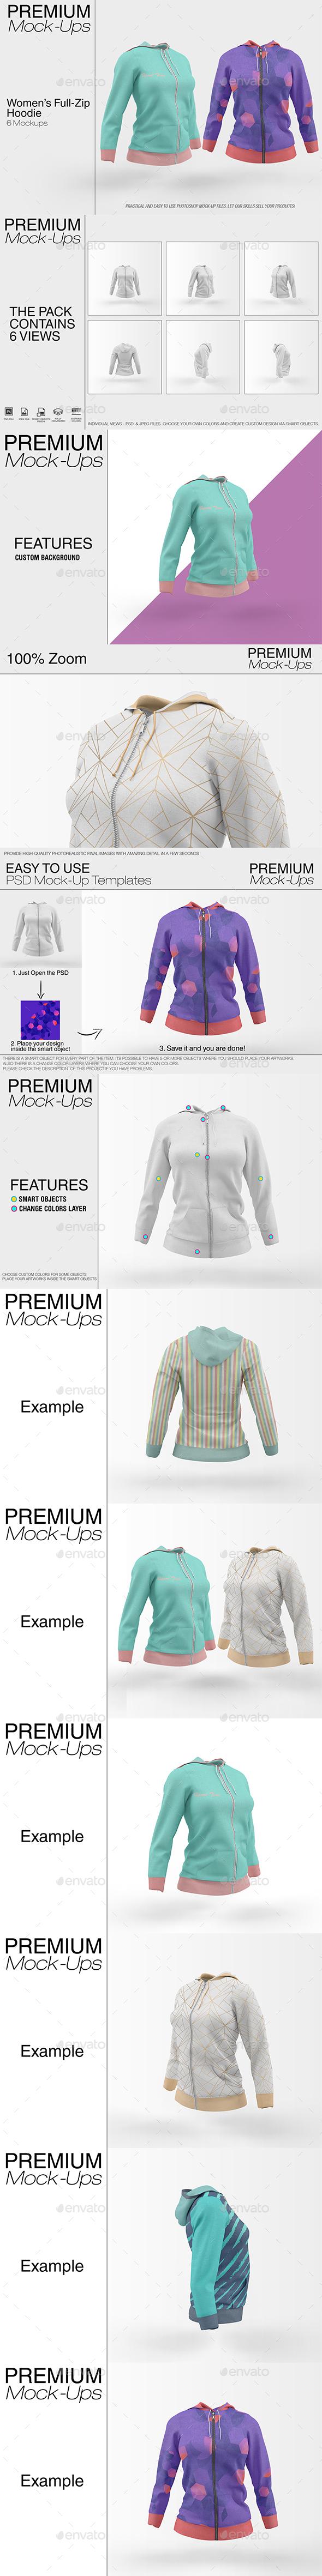 Women's Full-Zip Hoodie Mockup - Print Product Mock-Ups